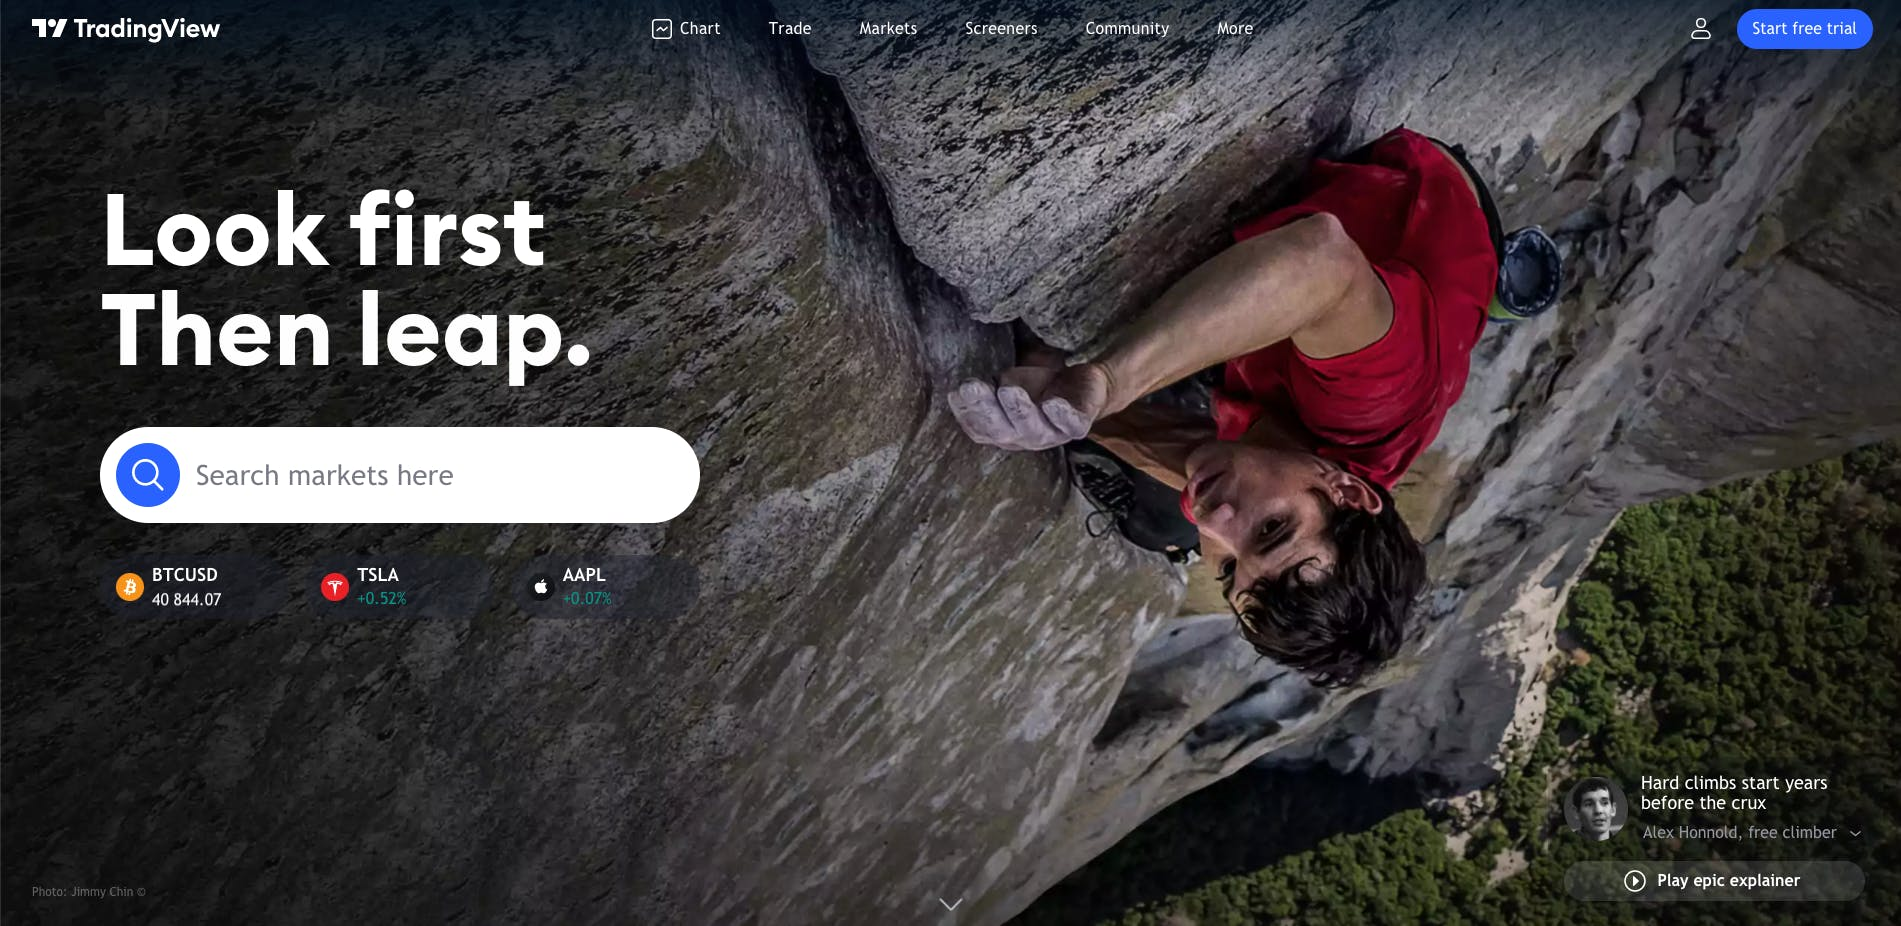 TradingView's new homepage